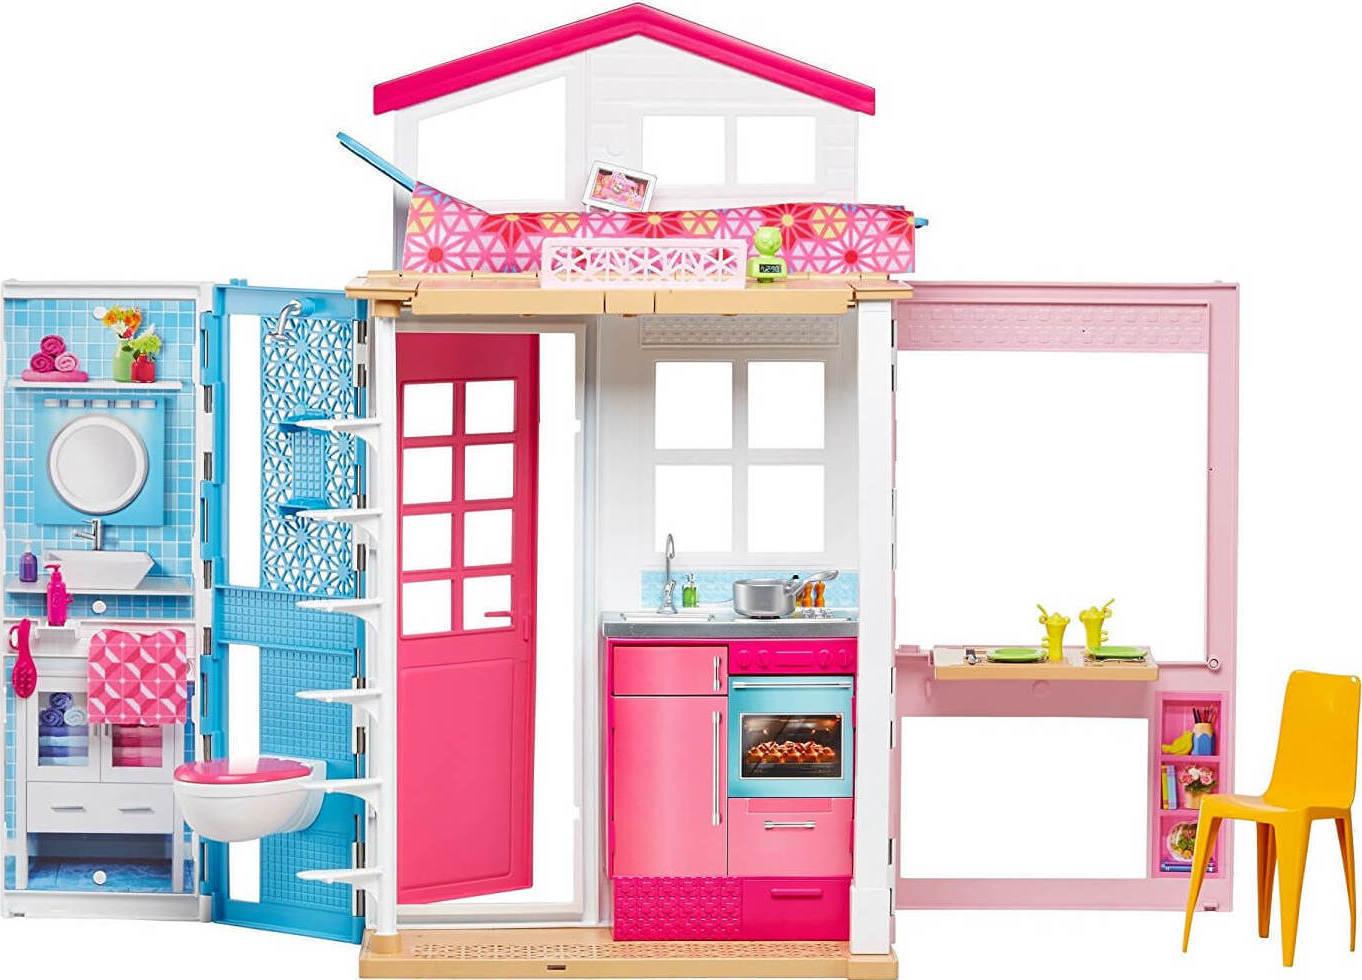 551380e6d21 Προσθήκη στα αγαπημένα menu Mattel Barbie: Σπιτάκι Βαλιτσάκι DVV47